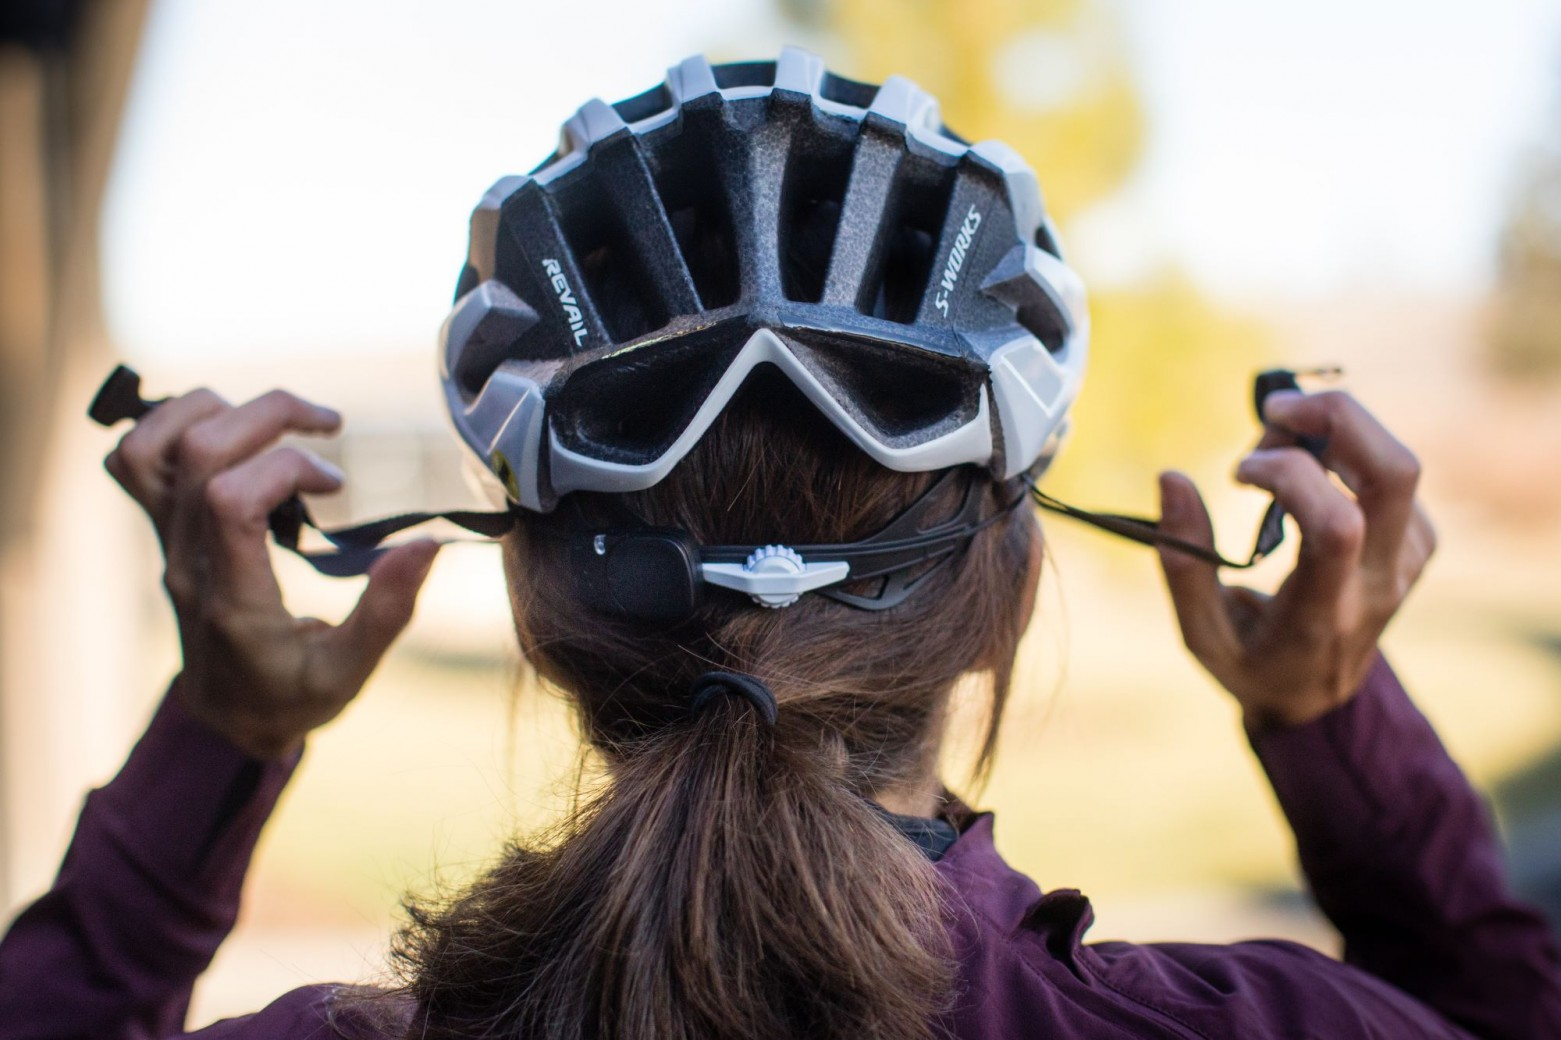 casco-bici-obligatorio-para-siempre/